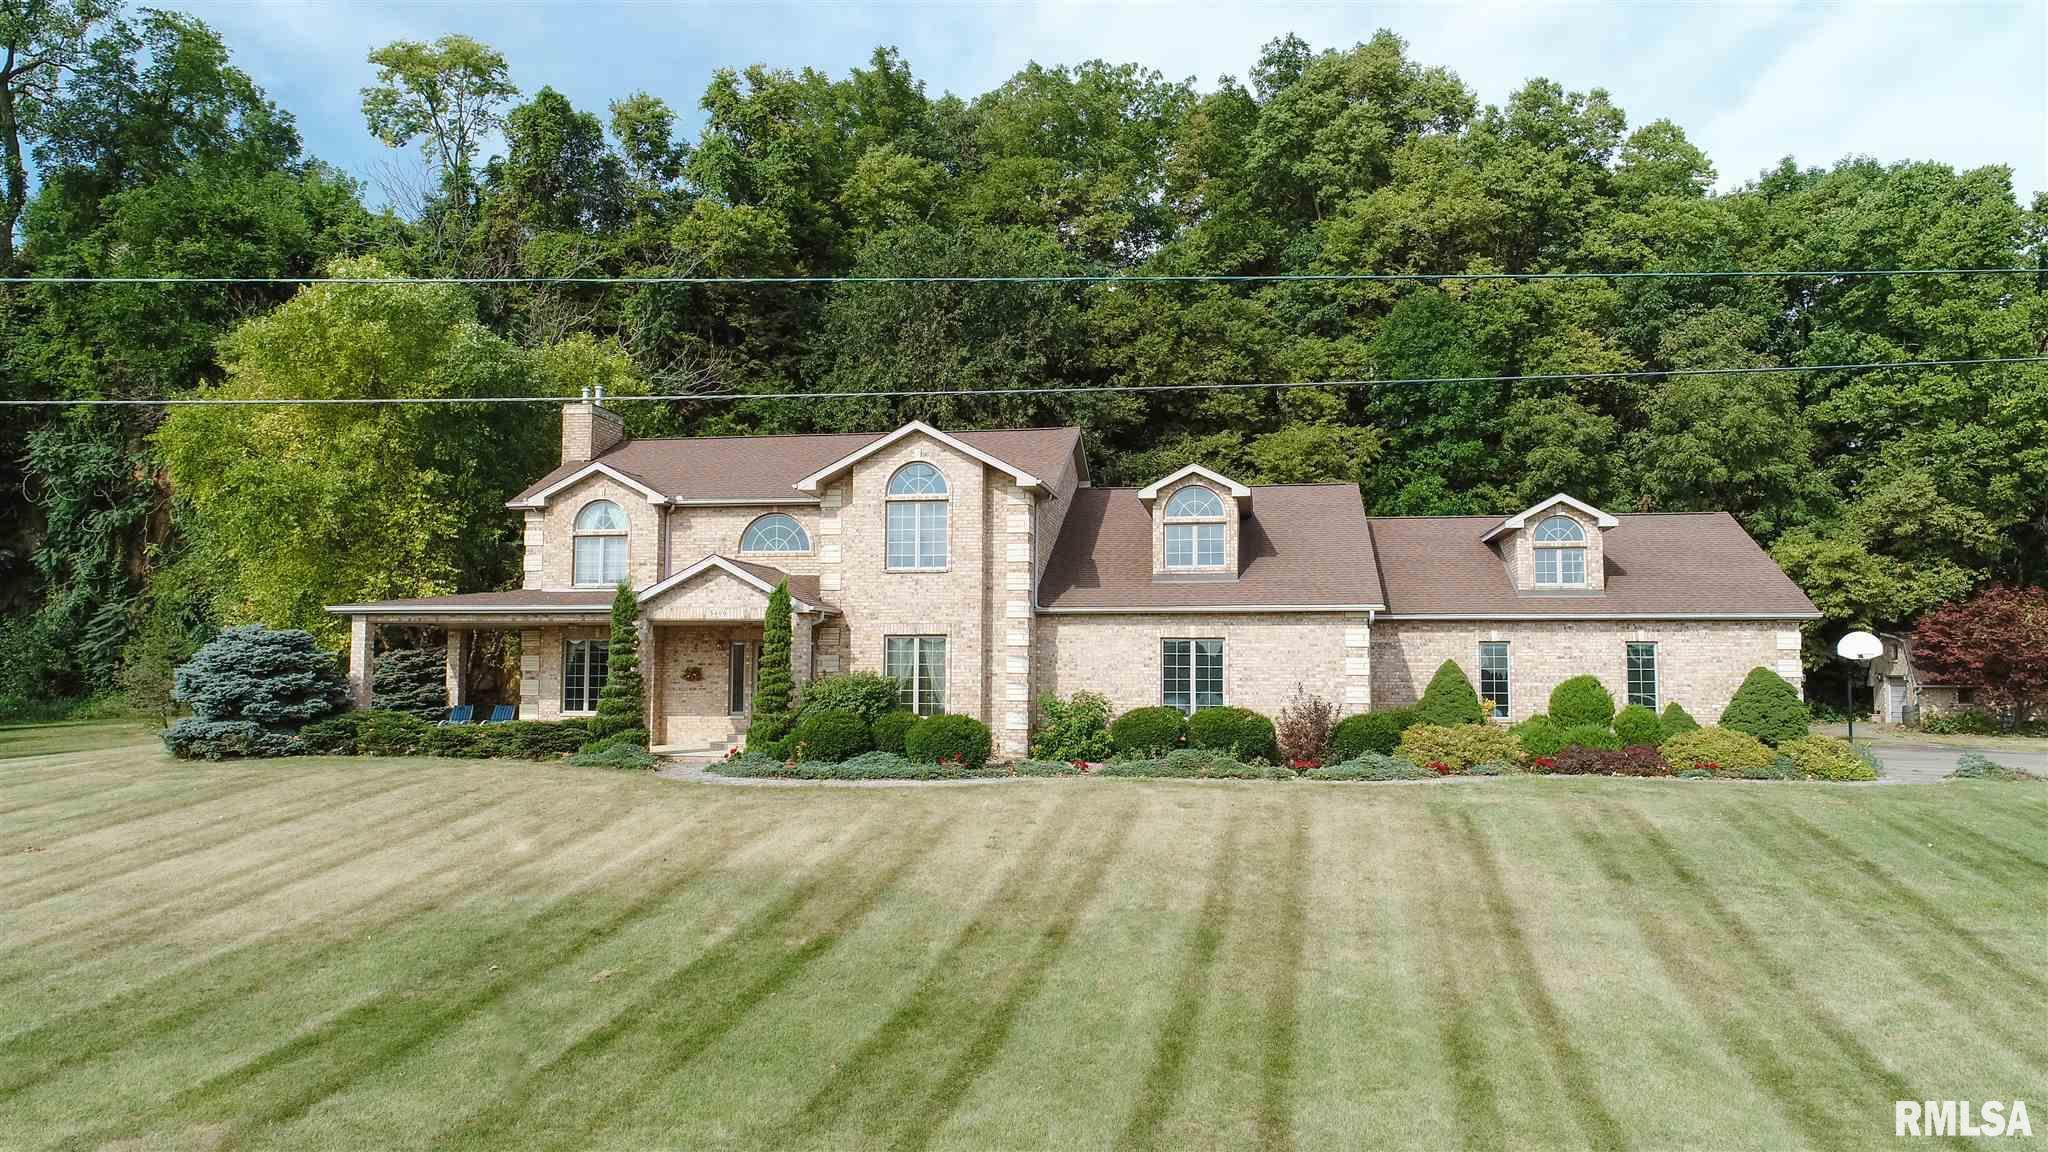 3400 MCKINLEY Property Photo - Clinton, IA real estate listing